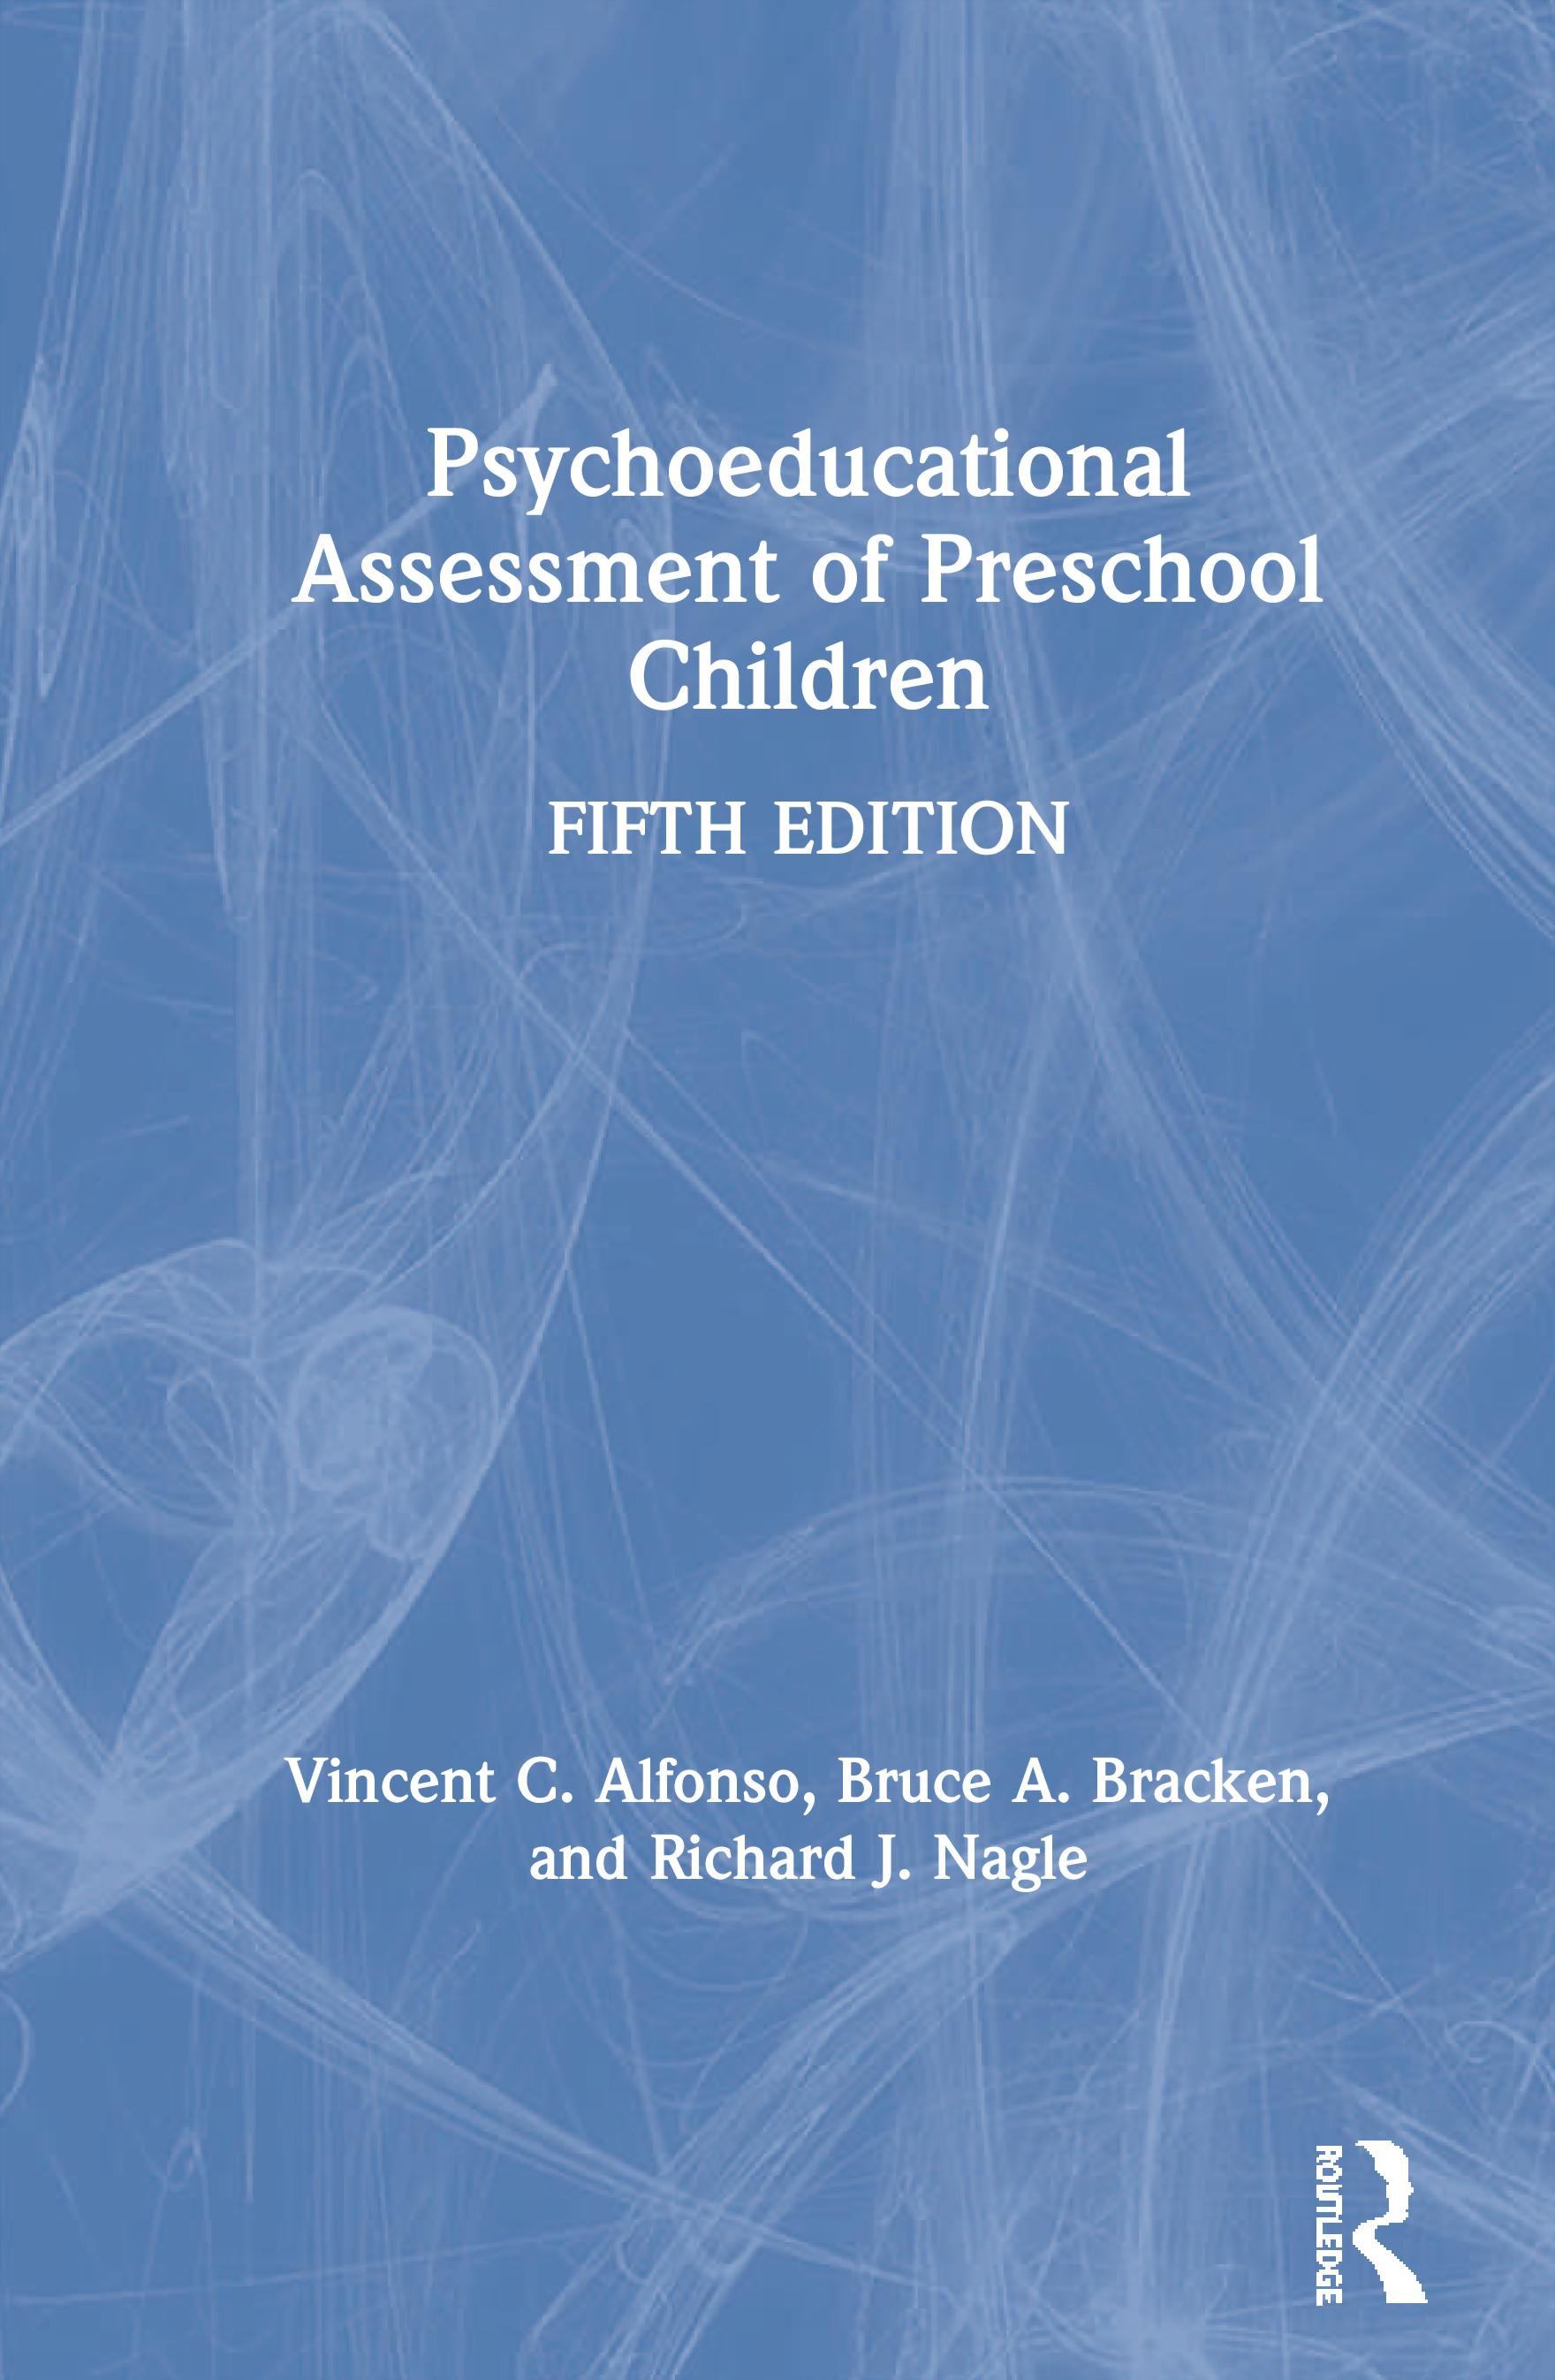 Psychoeducational Assessment of Preschool Children book cover